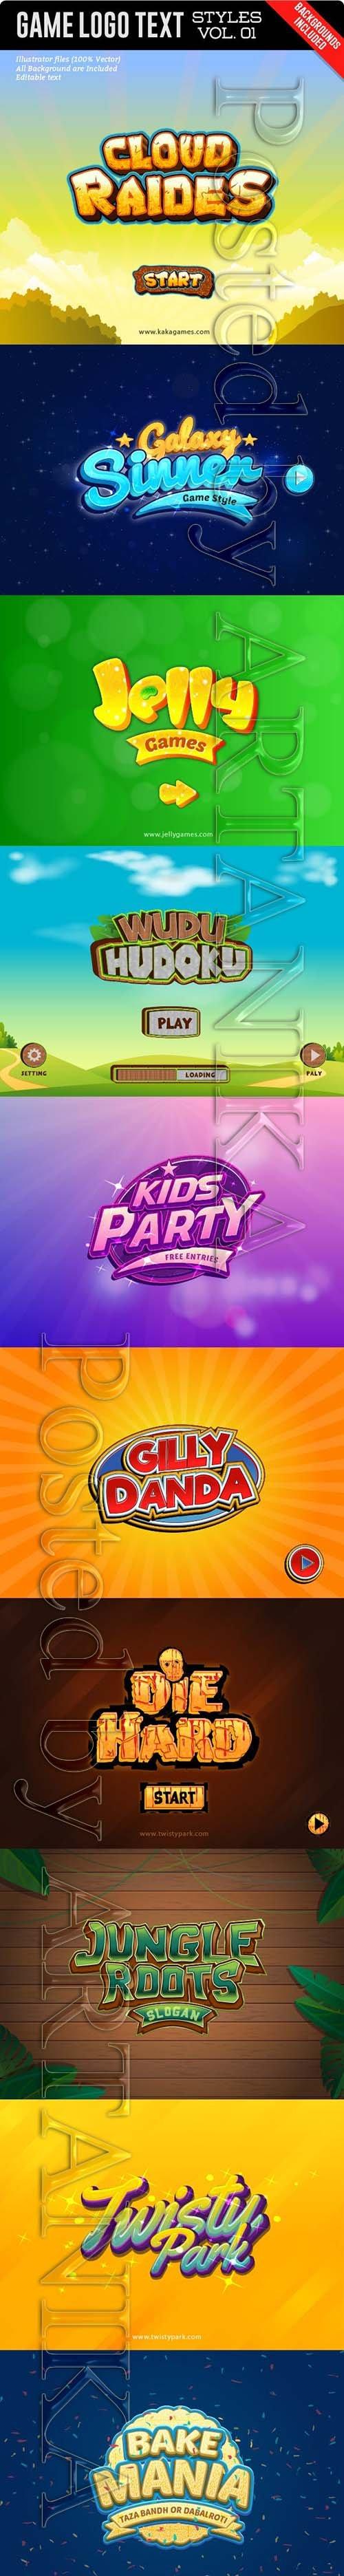 Game Logo Text Styles 18623318